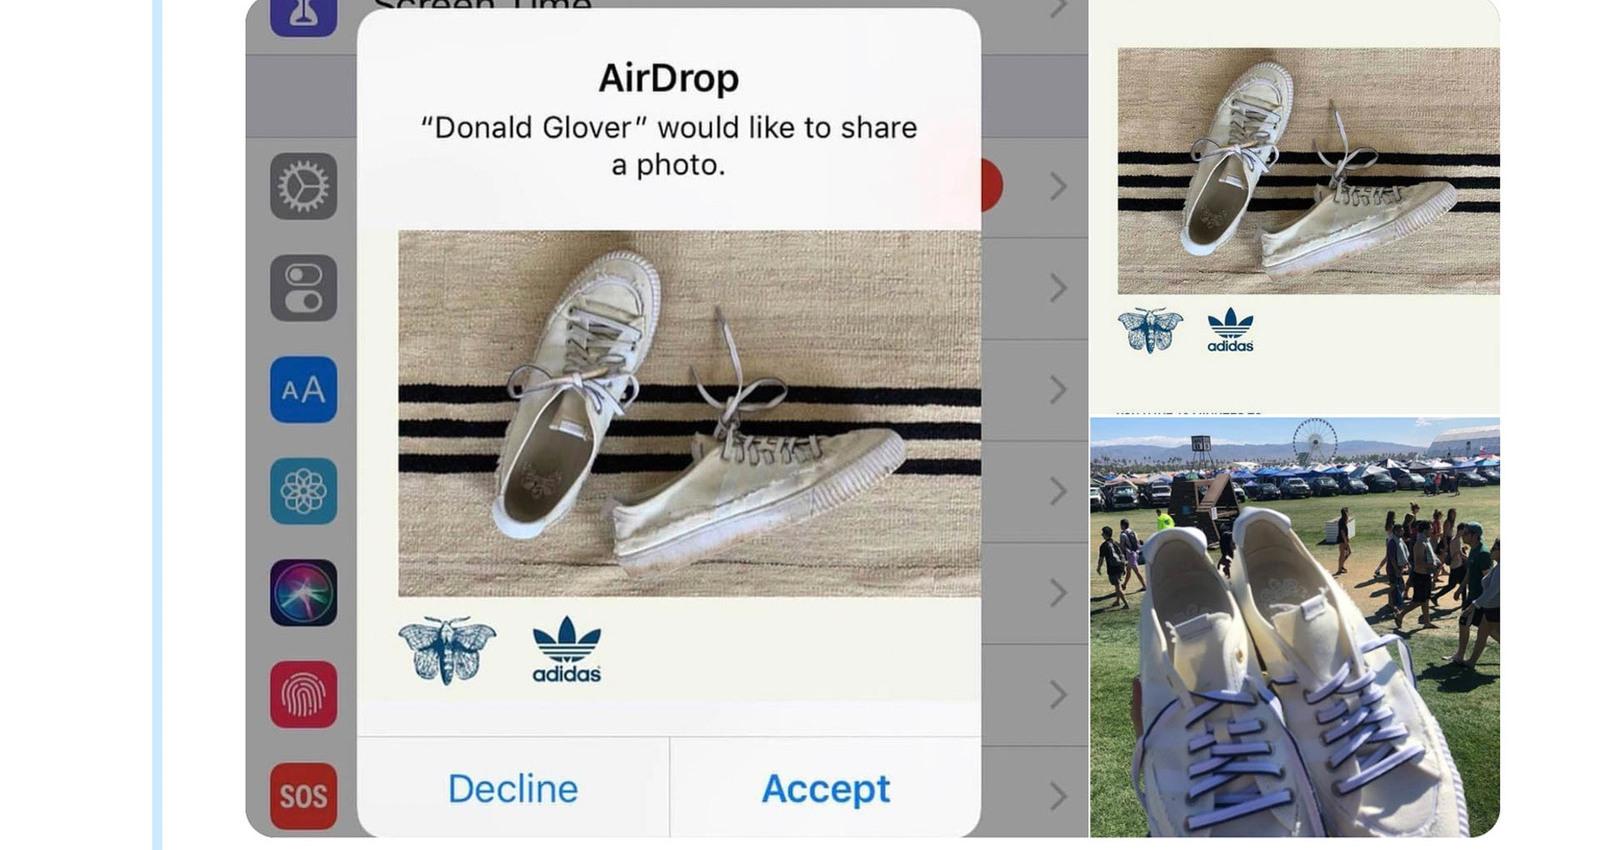 adidas Operation AirDrop